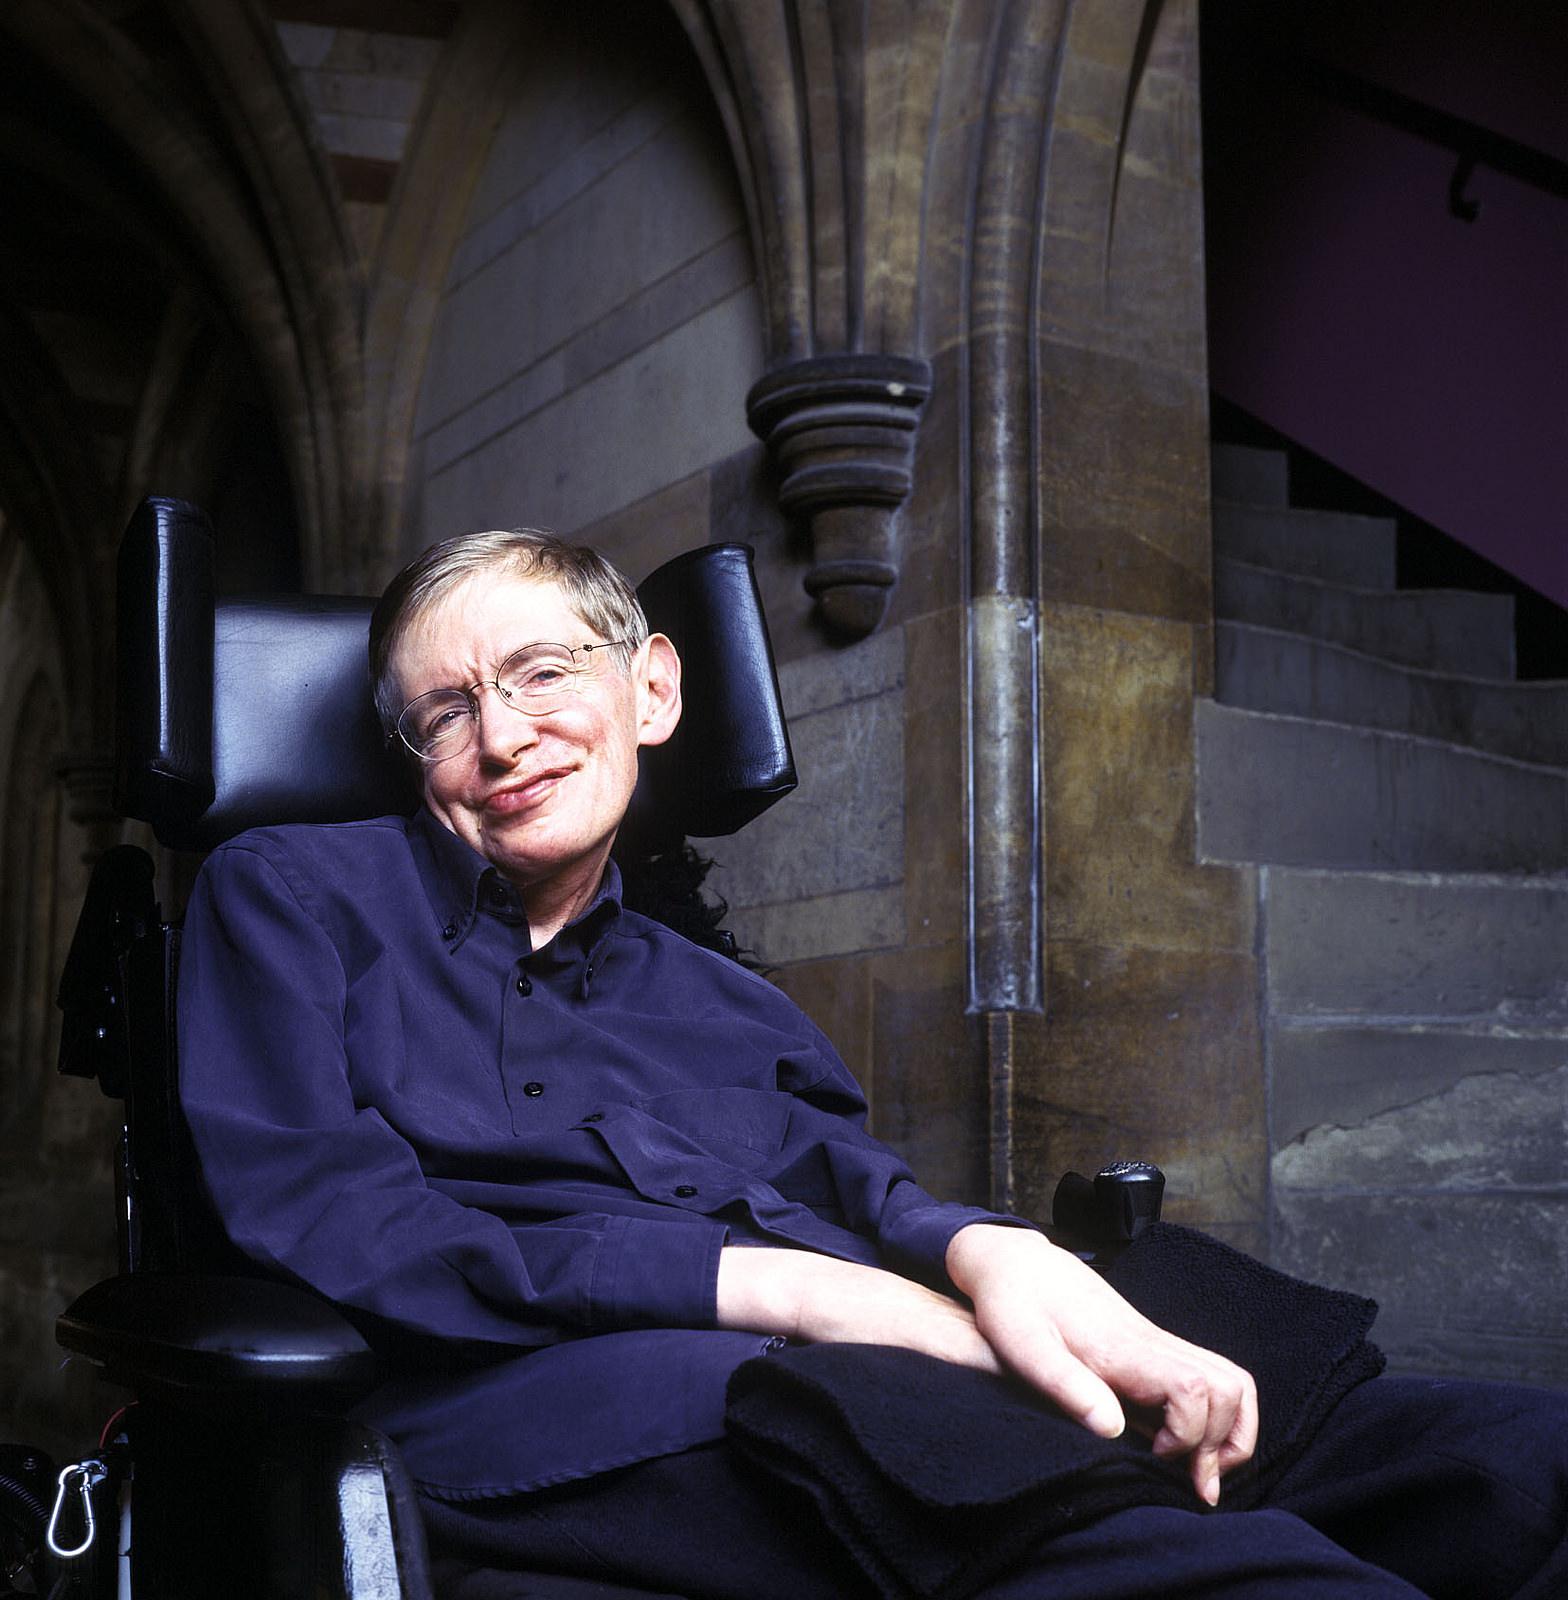 Stephen Hawking quiere ser un villano Bond